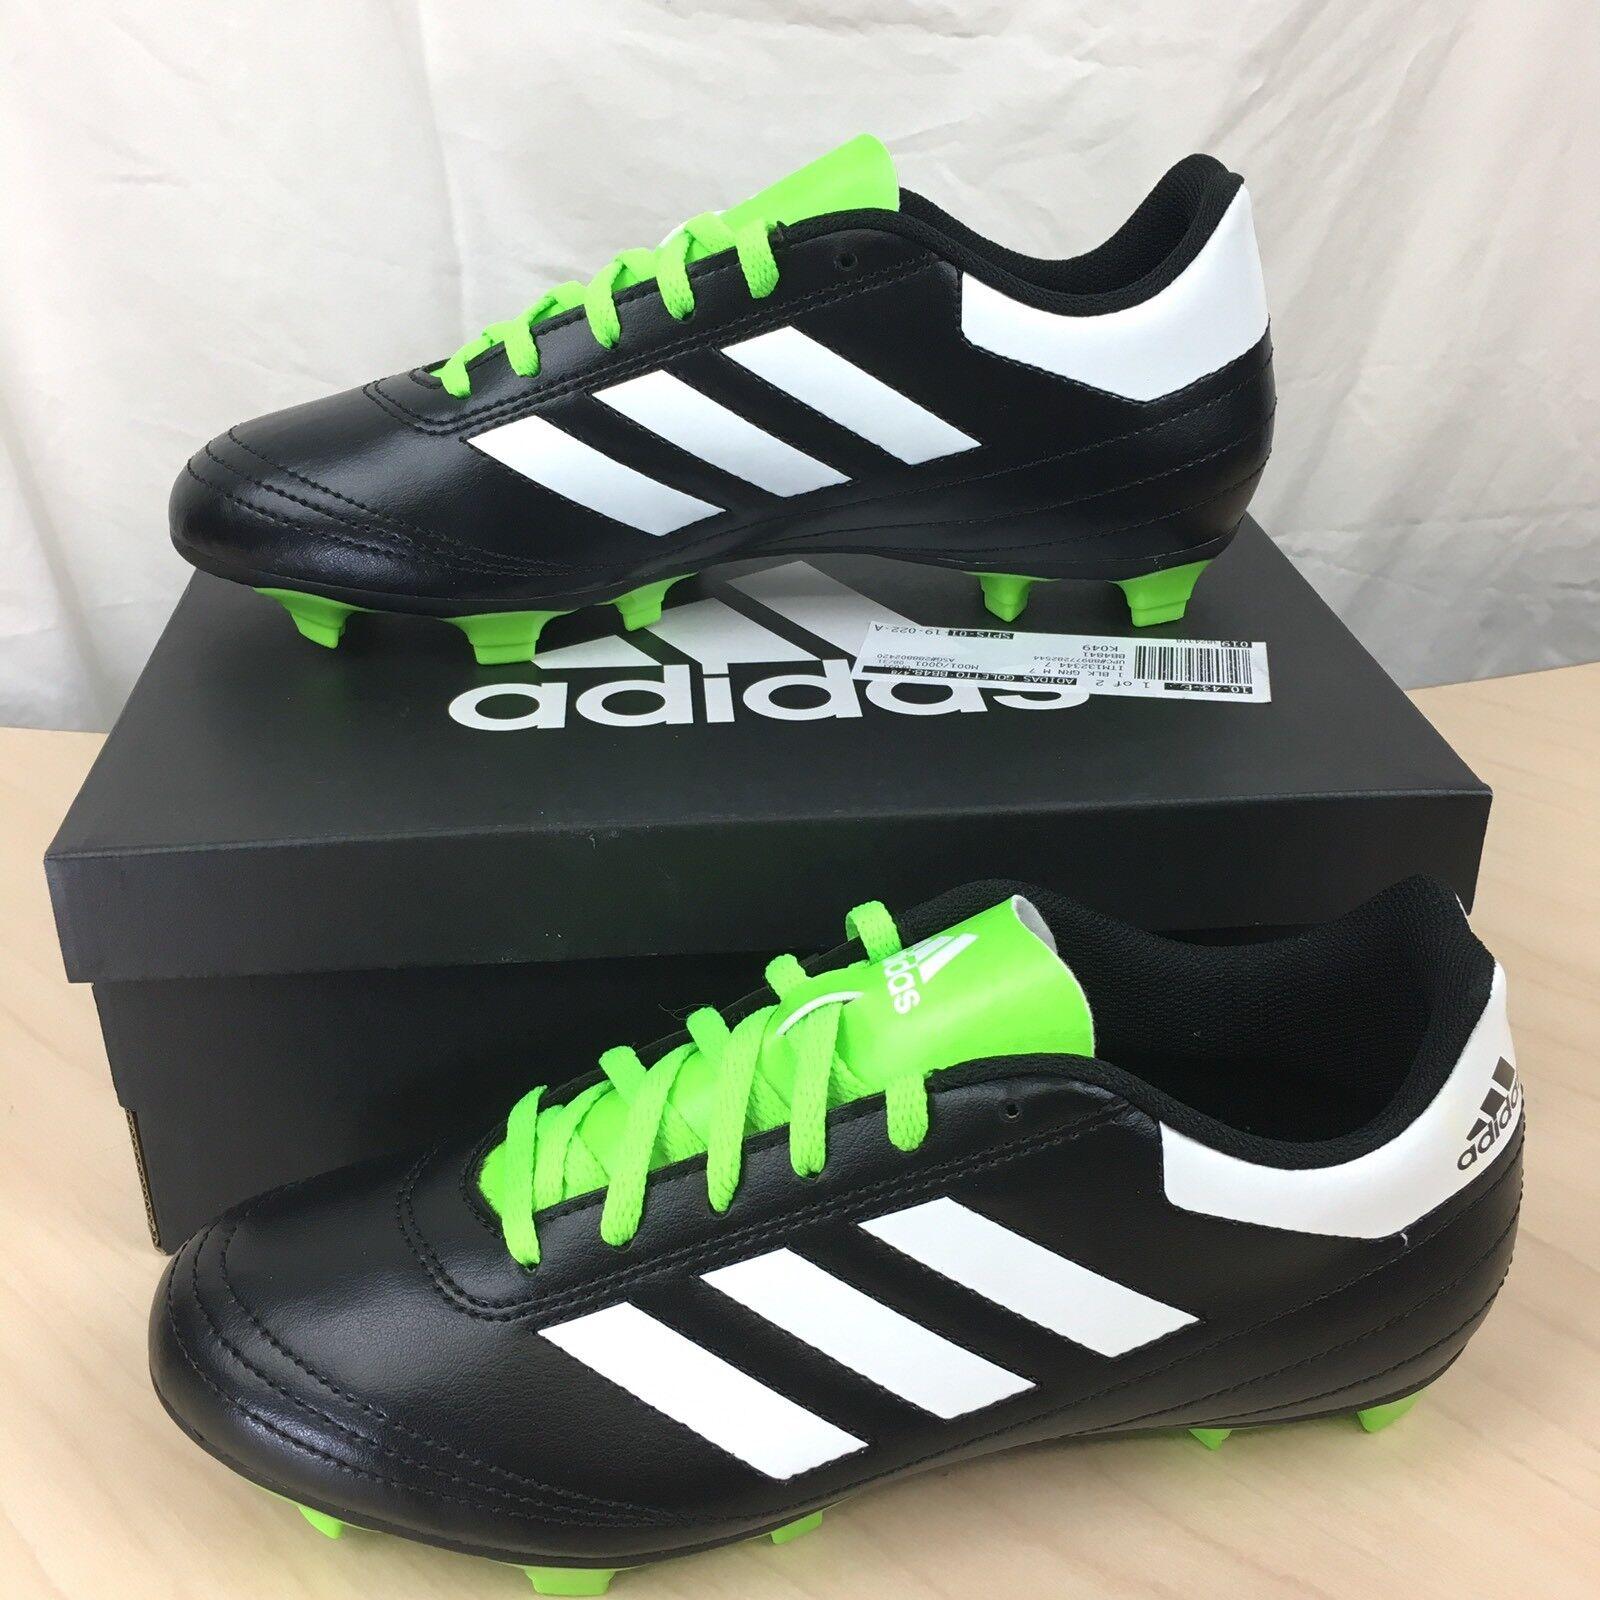 Adidas Goletto VI FG - Soccer - Size 7 or 9 - New - Mens